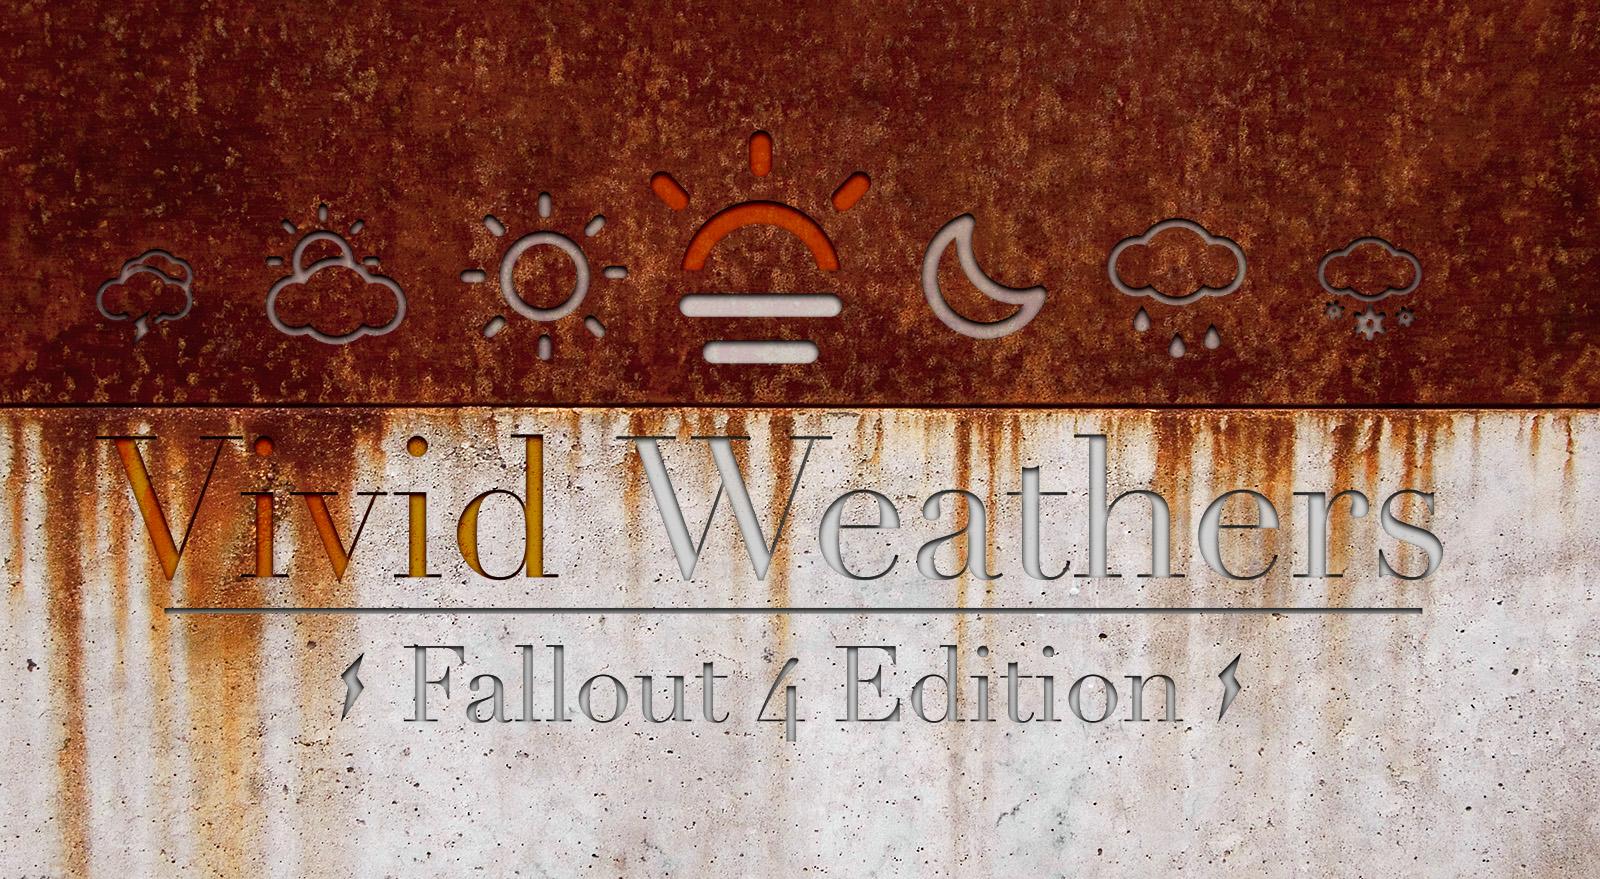 Vivid Weathers